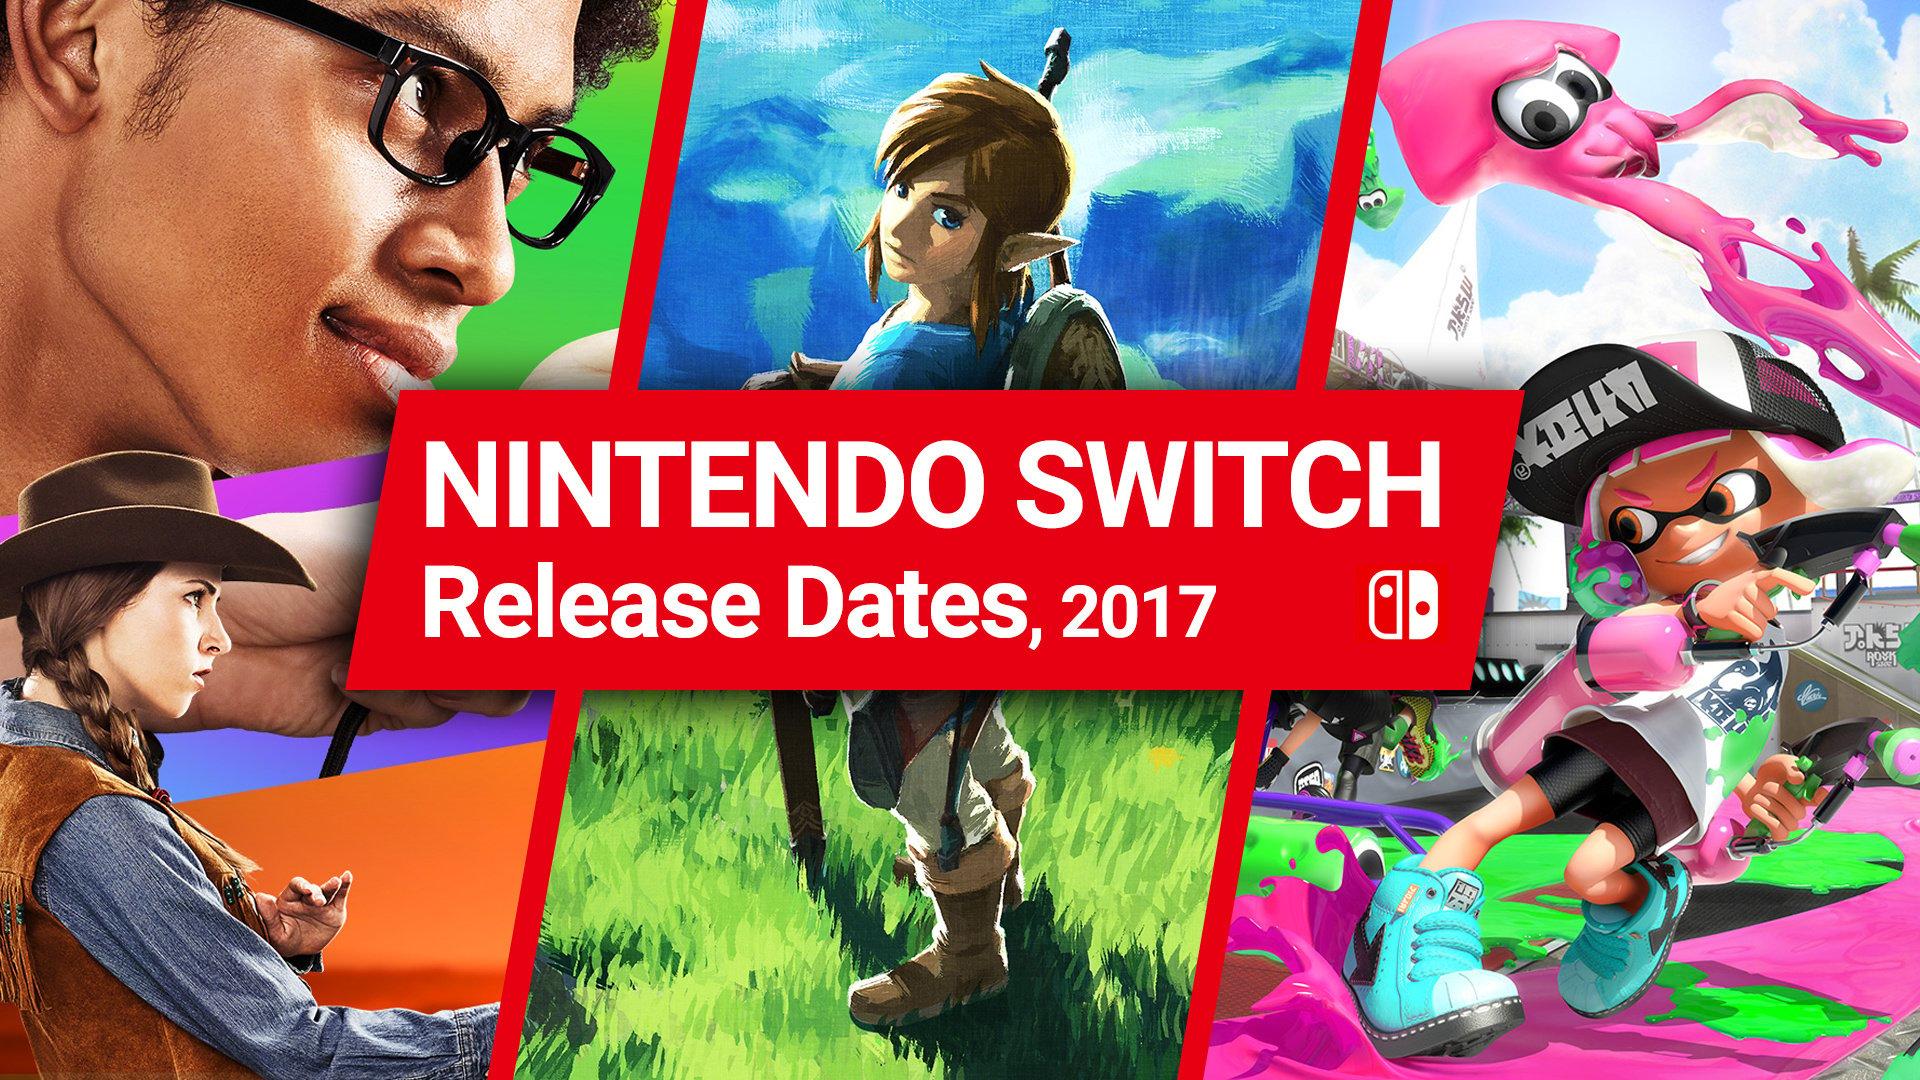 Nintendo Switch Launch Games & Release Dates 2017 - Guide - Nintendo